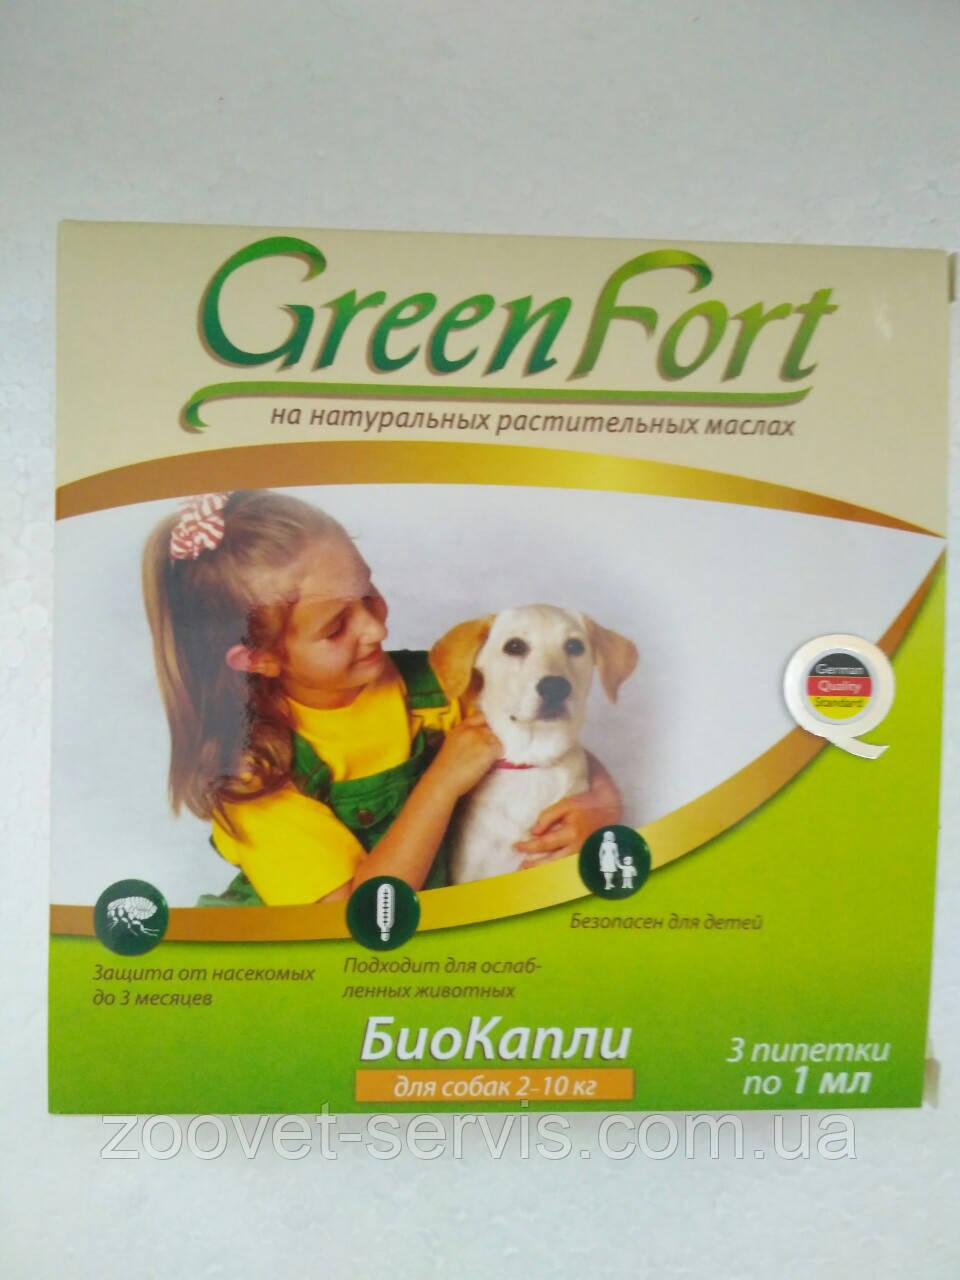 Биокапли GreenFort для мелких собак, упаковка 3 пипетки по 1мл